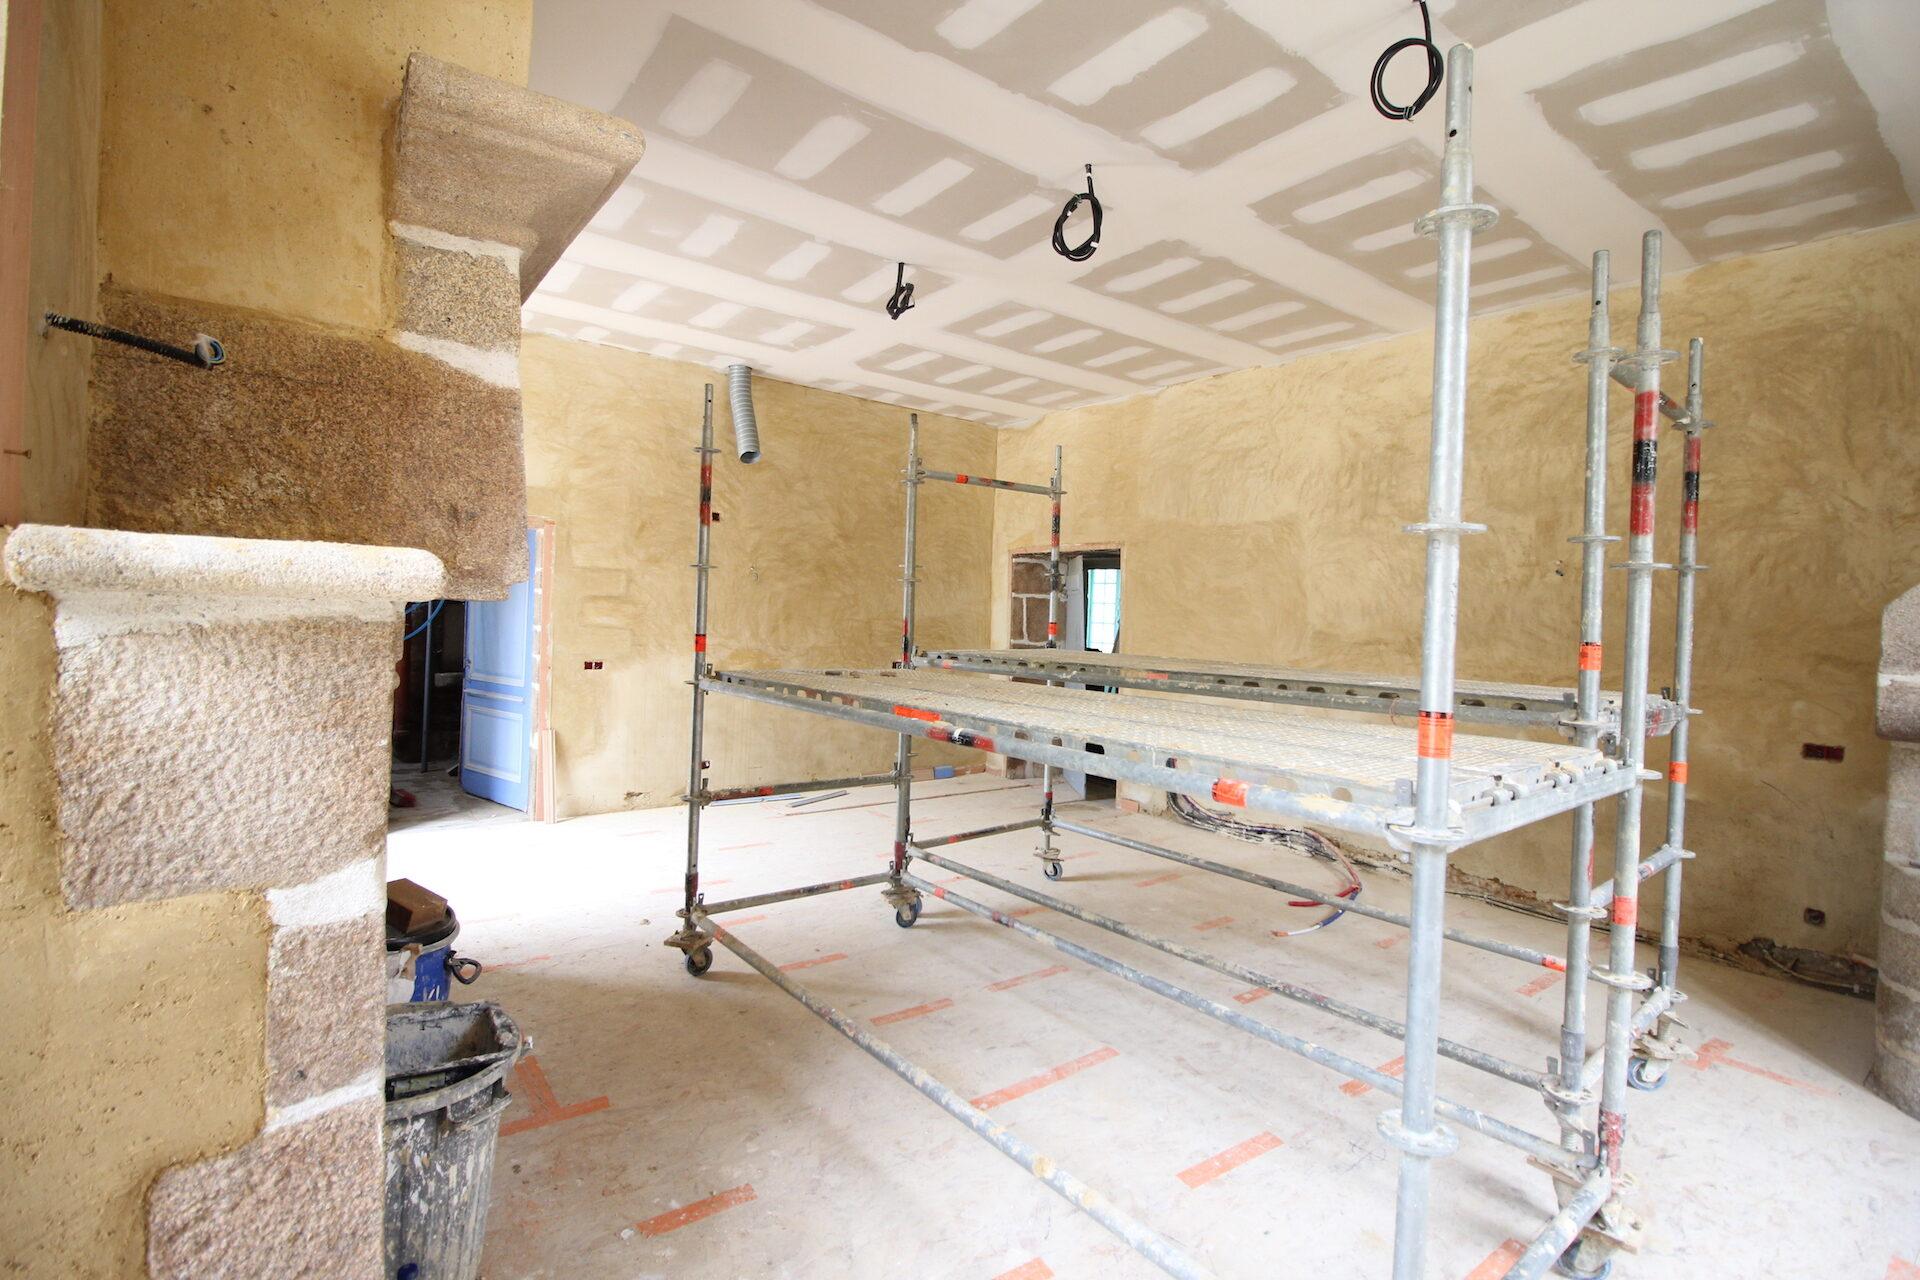 CSDK Lissage de murs en terre Bretagne 1 1920x1280 - Sustainable engagement - CSDK Lissage de murs en terre Bretagne 1 1920x1280